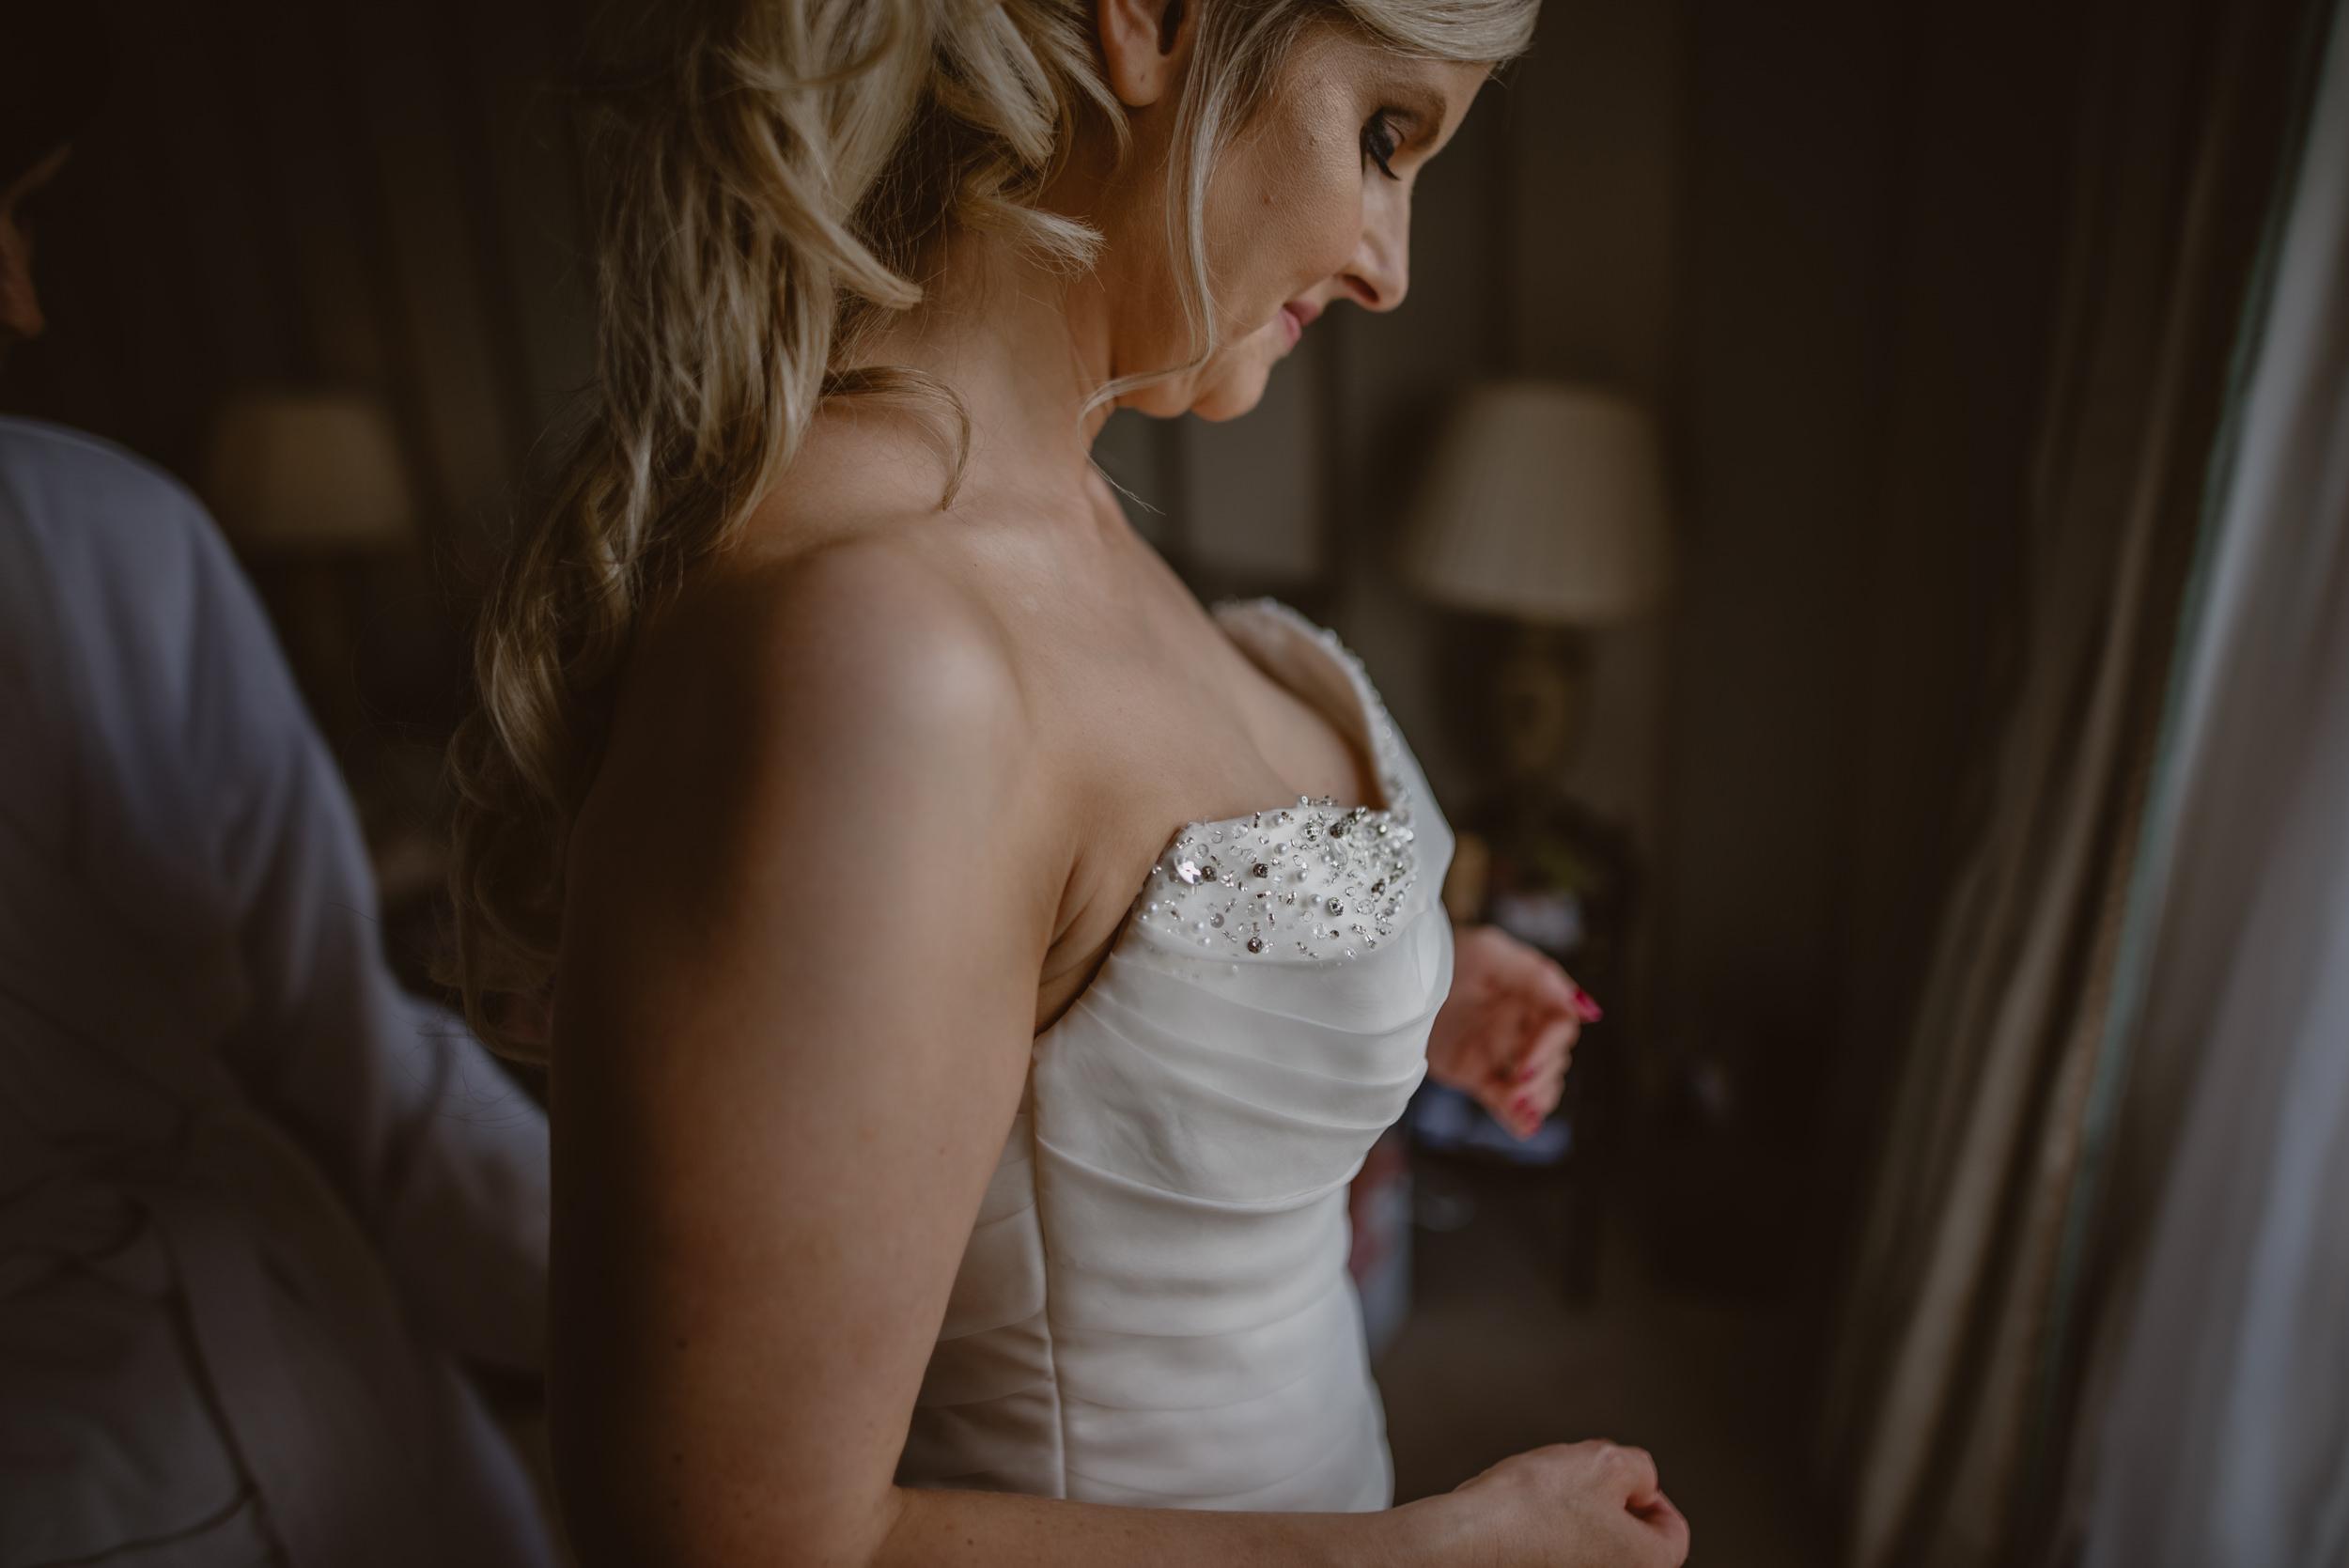 Trisha-and-Roger-wedding-The-Priory-Church-and-Chewton-Glen-Hotel-Christchurch-Manu-Mendoza-Wedding-Photography-056.jpg